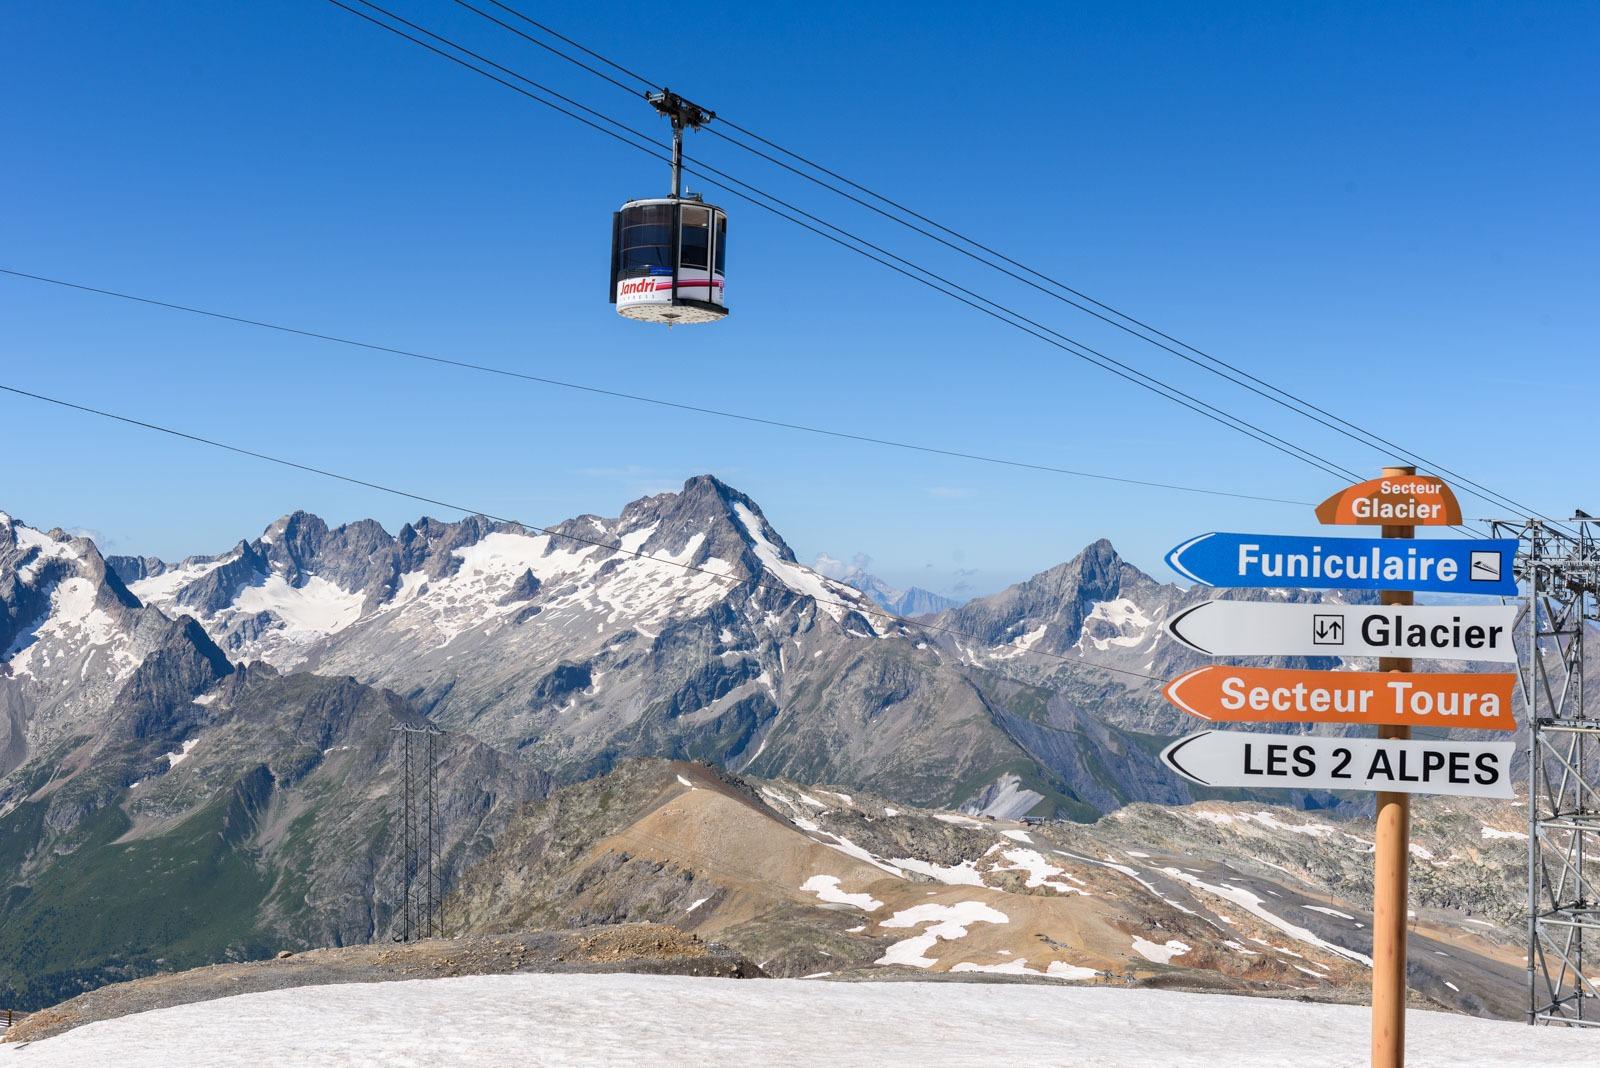 Gisella Motta Les 2 Alpes